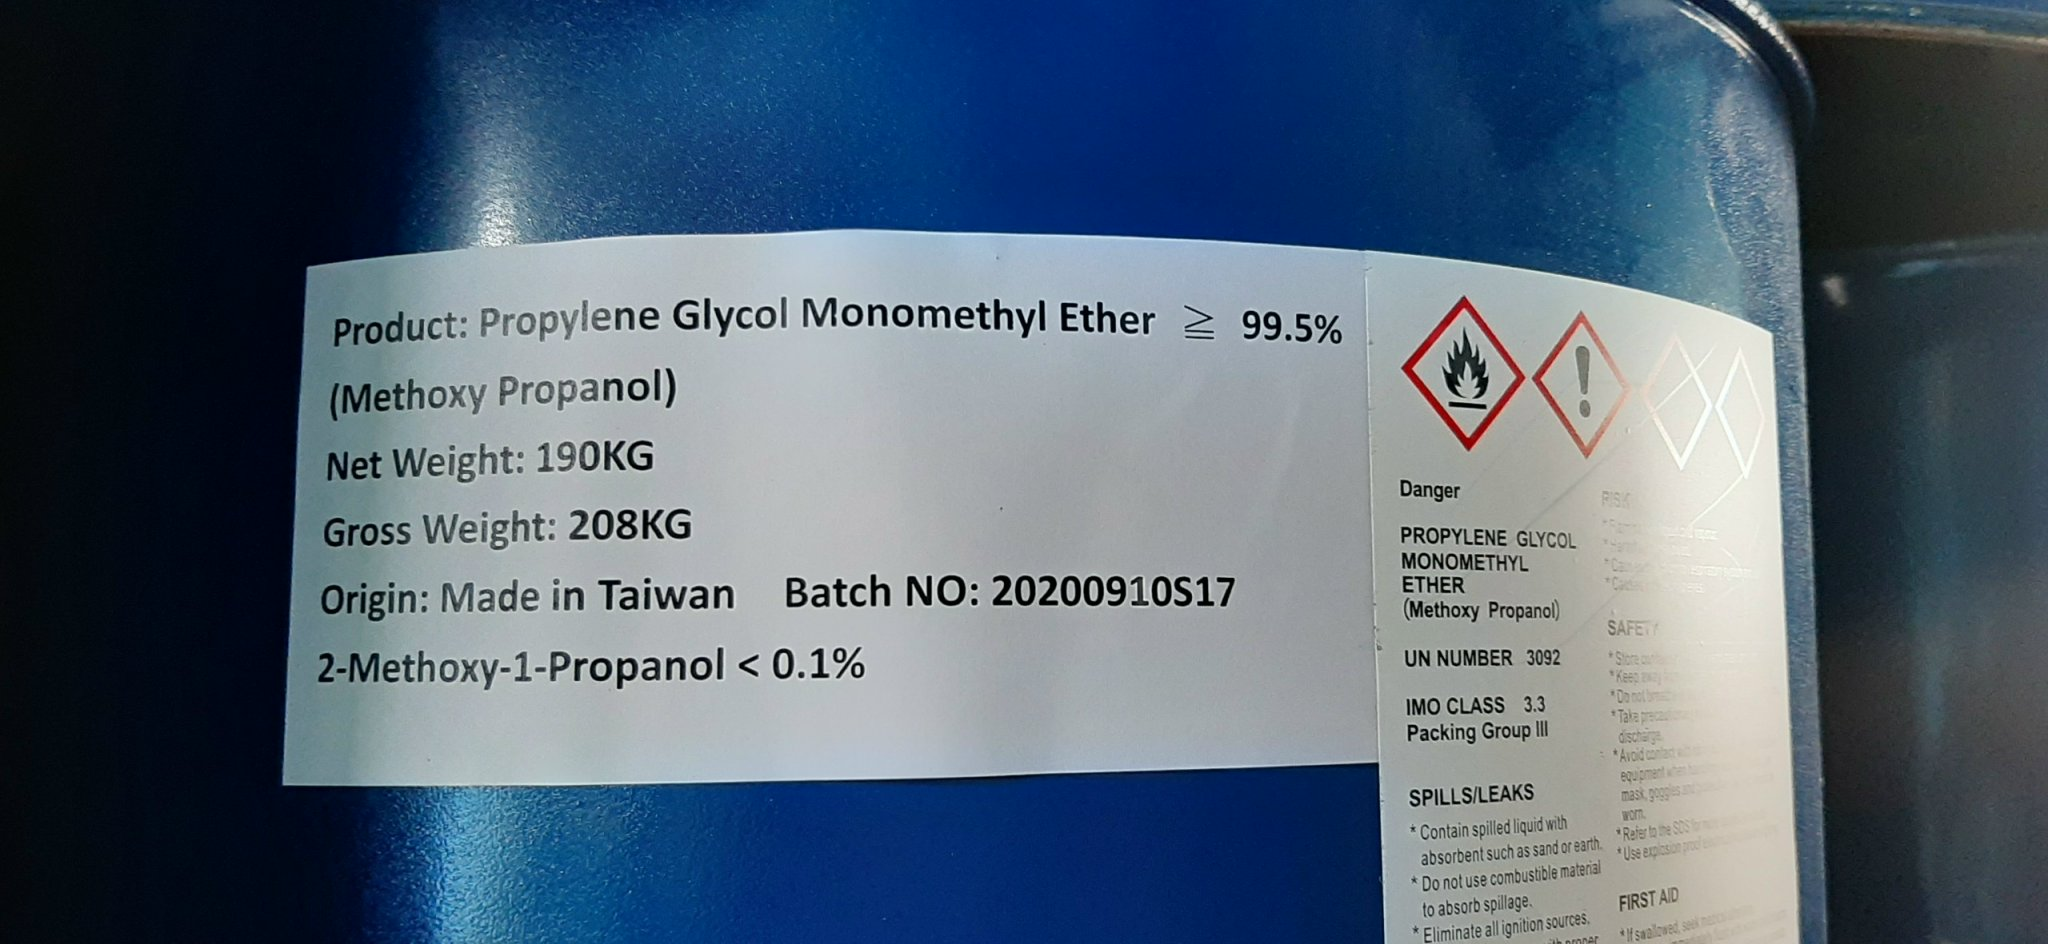 PROPYLENE GLYCOL METHYL ETHER (1-Methoxy-2-propanol) (PM) C4H10O2